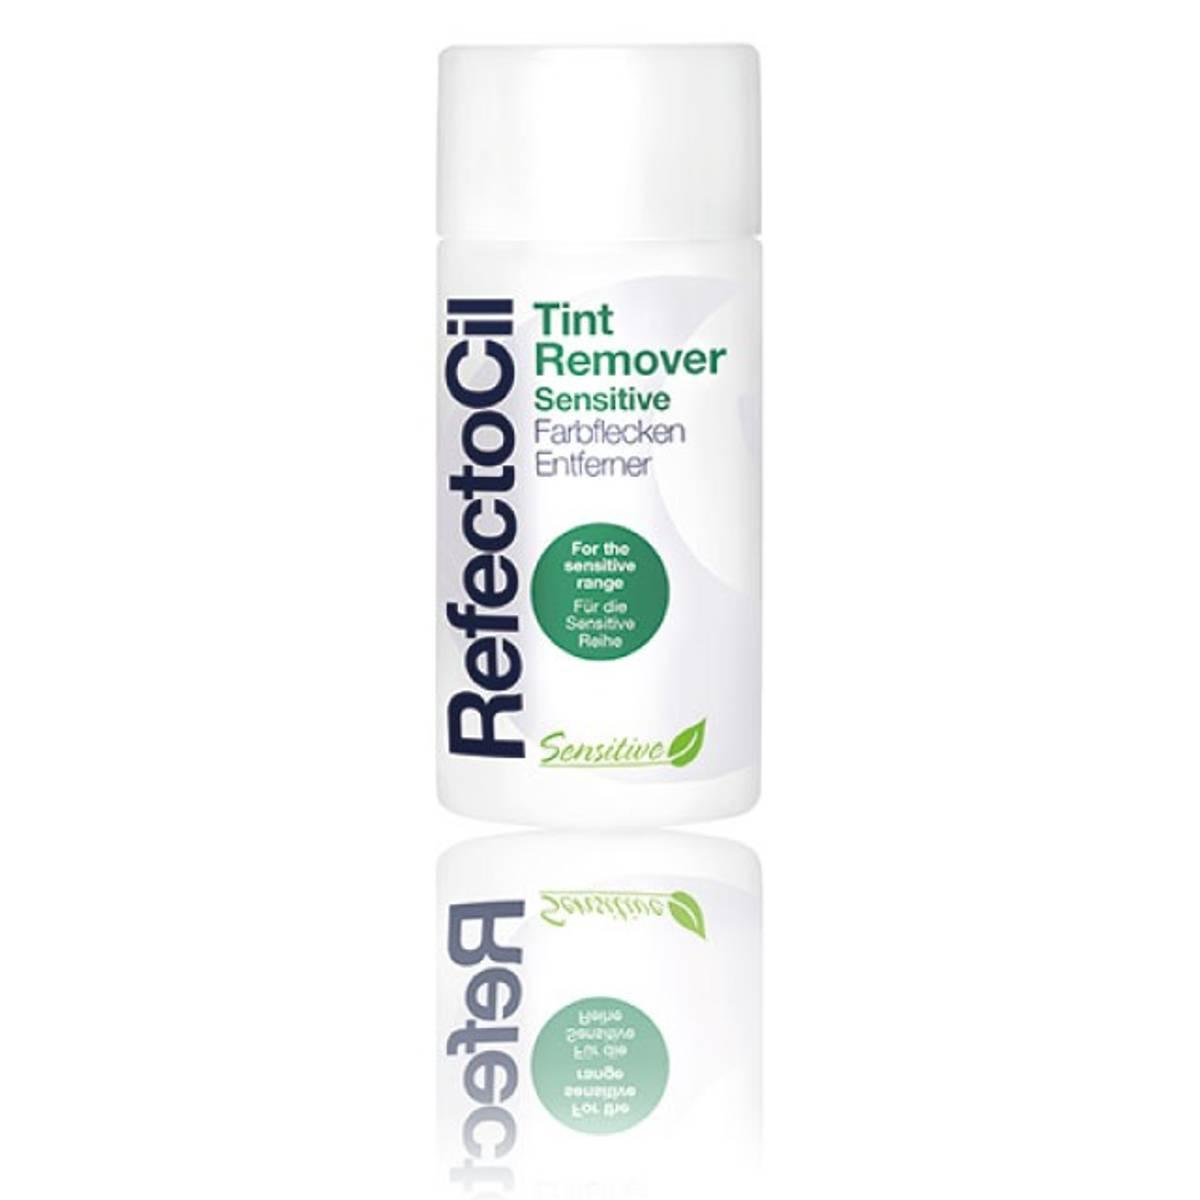 RefectoCil Sensitive Tint Remover 150 ml